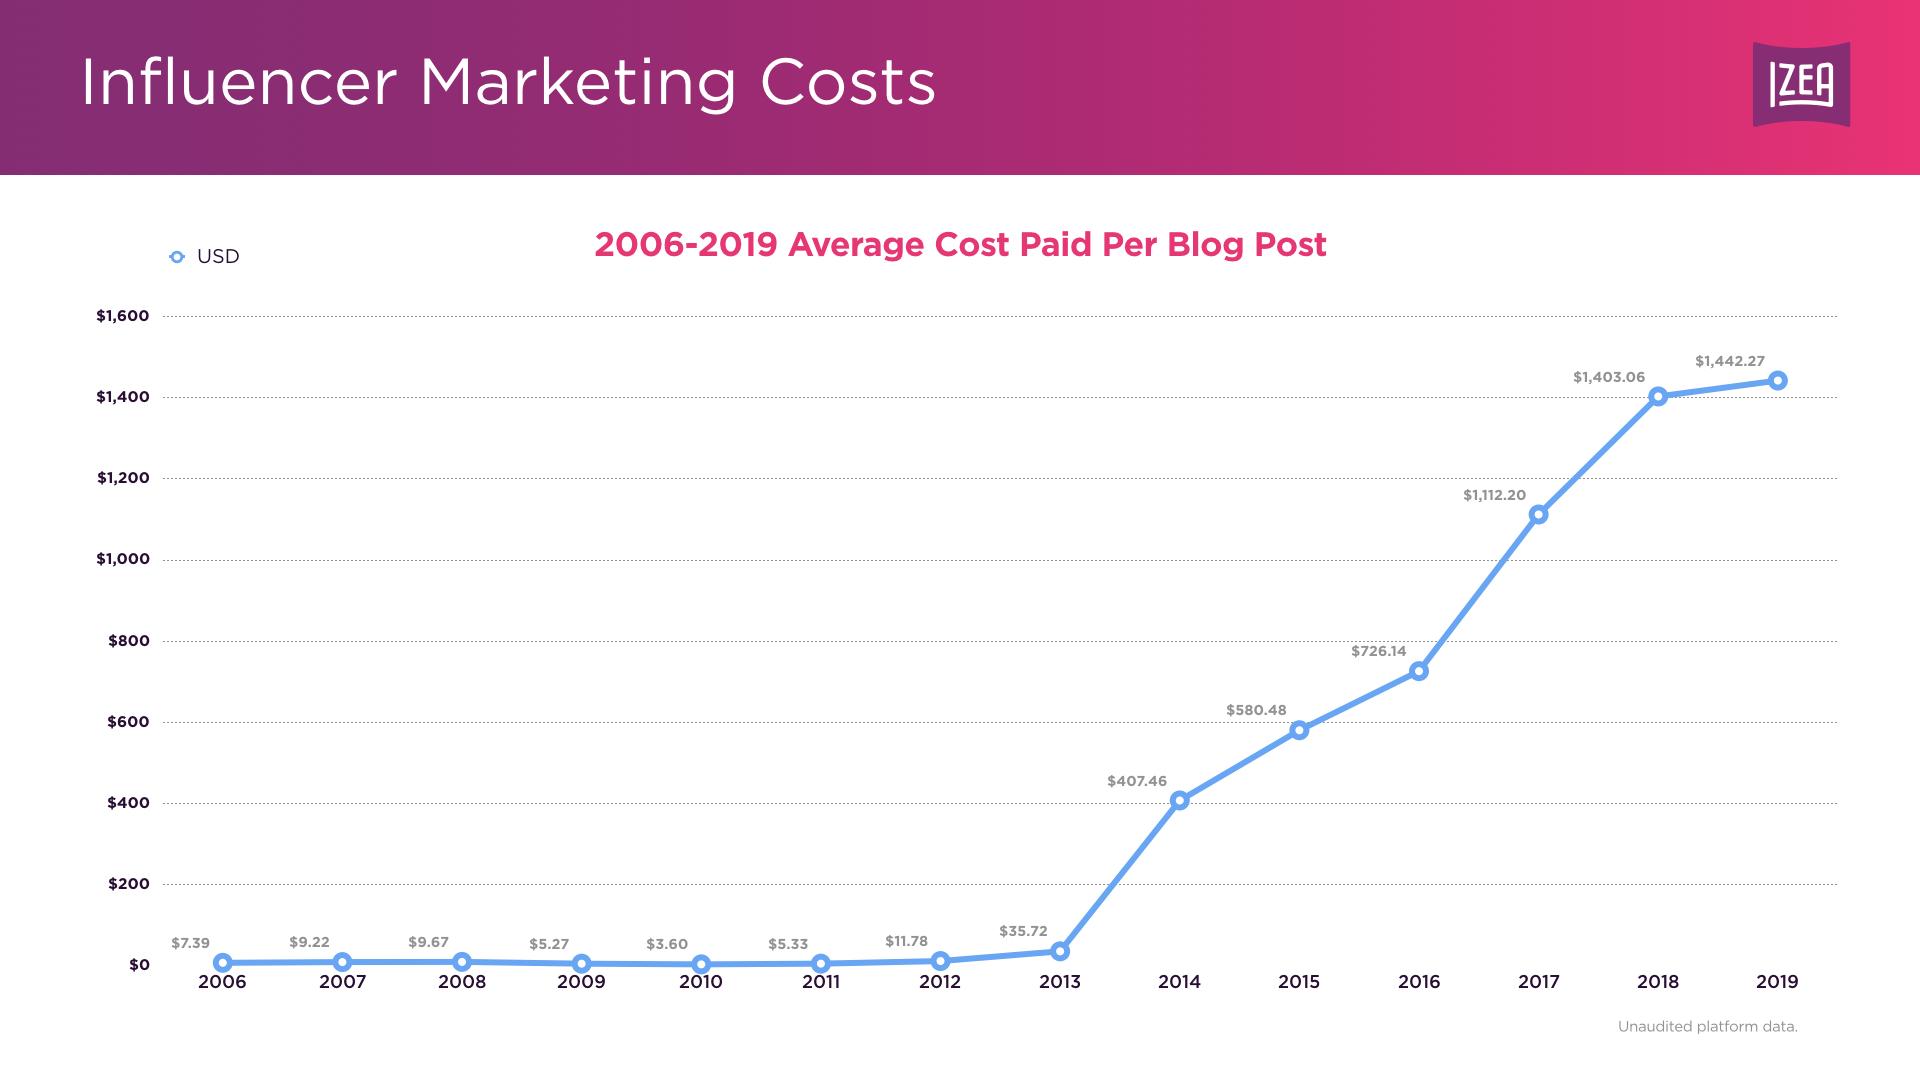 Average Price Paid Per Blogs Post - 2006-209